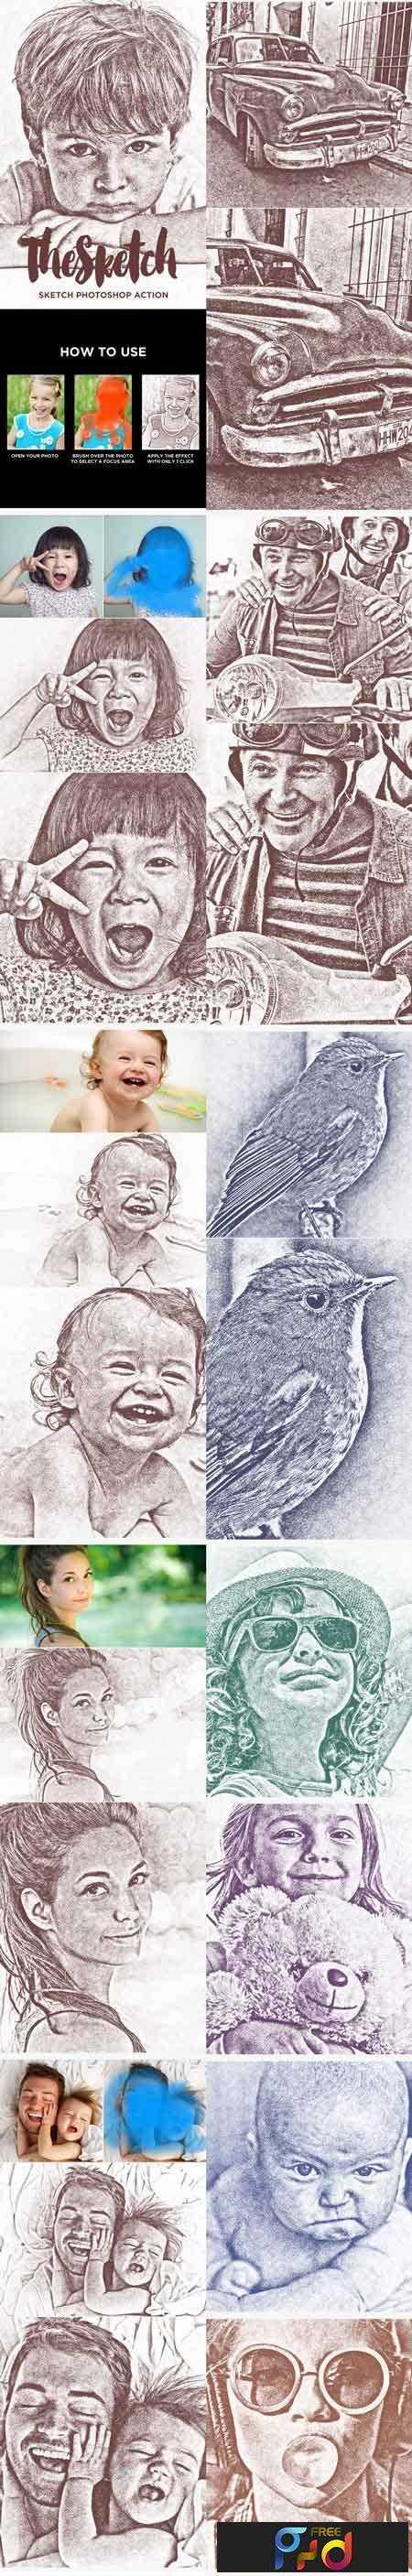 FreePsdVn.com_1702026_PHOTOSHOP_thesketch_sketch_photoshop_action_16089152